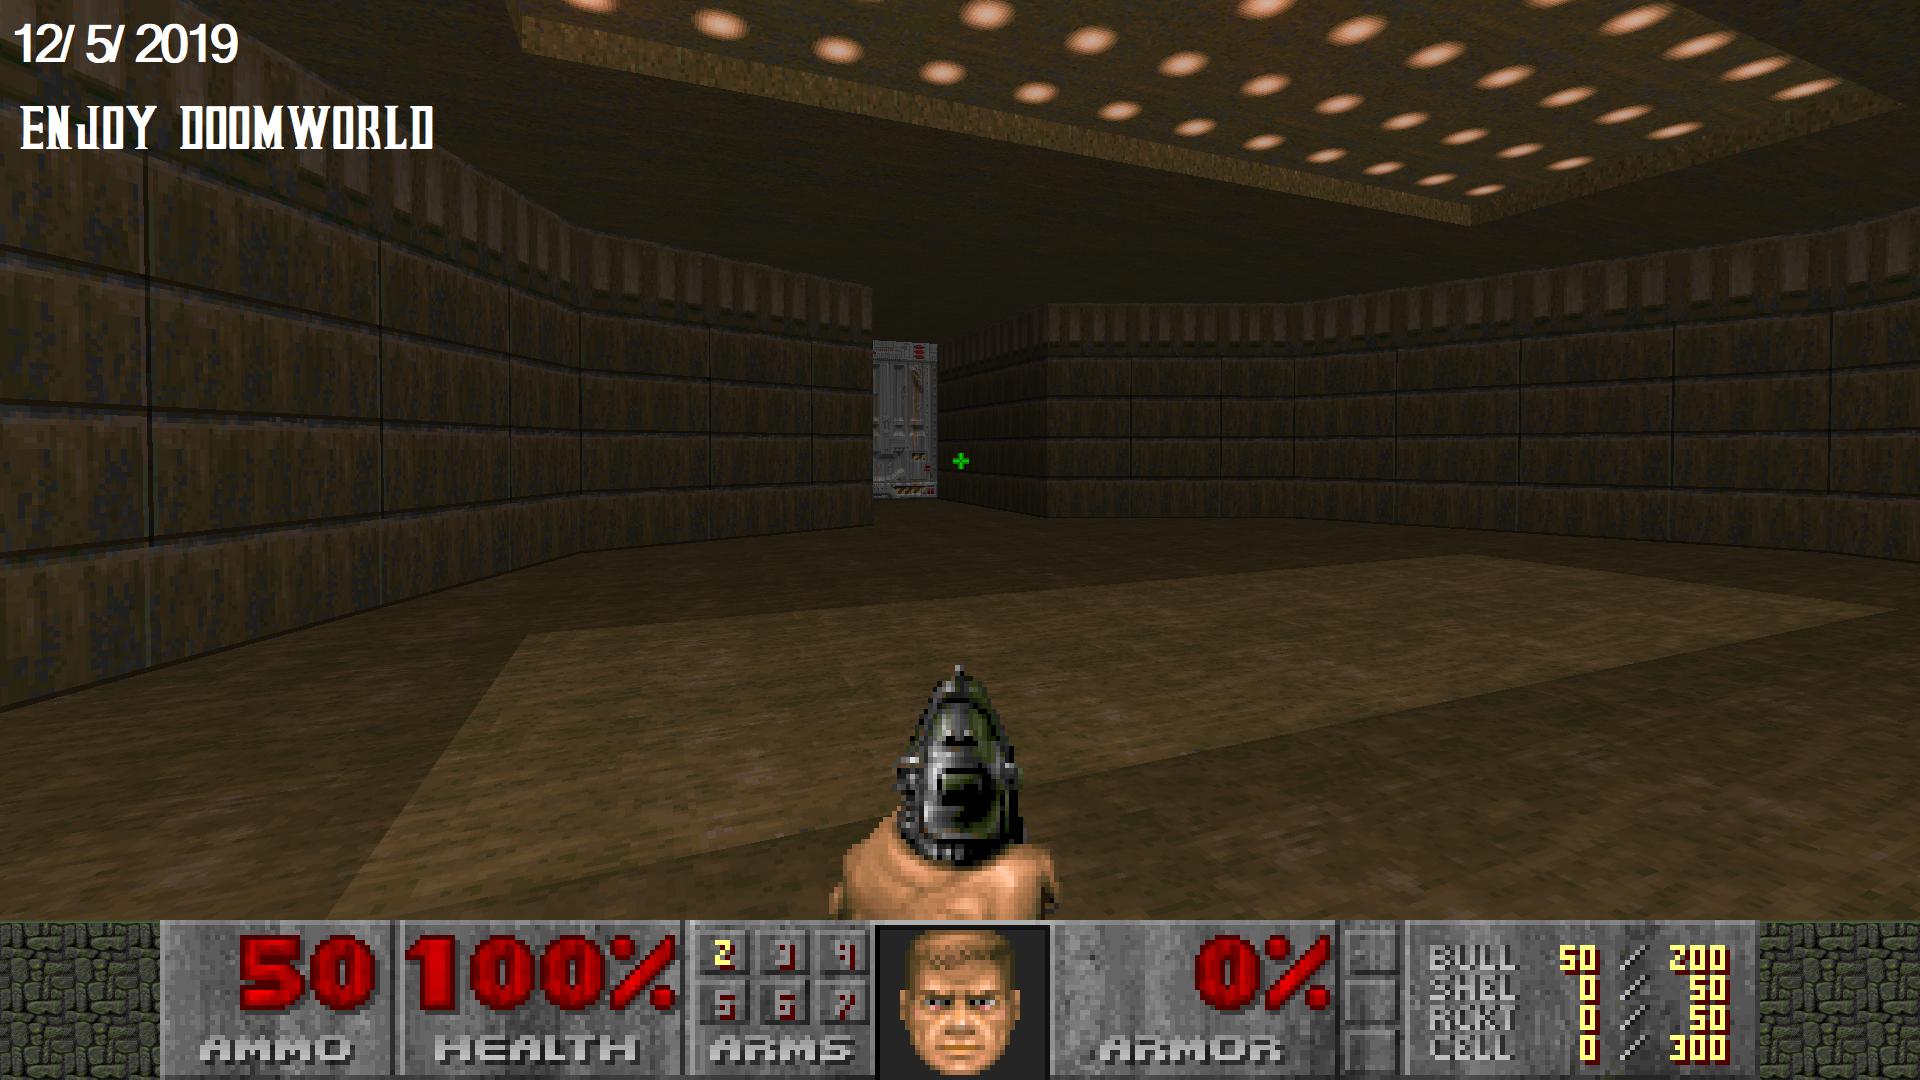 Screenshot_Doom_20191205_181009.png.0cff5e88ec181a53a320c142ec81de5a.png